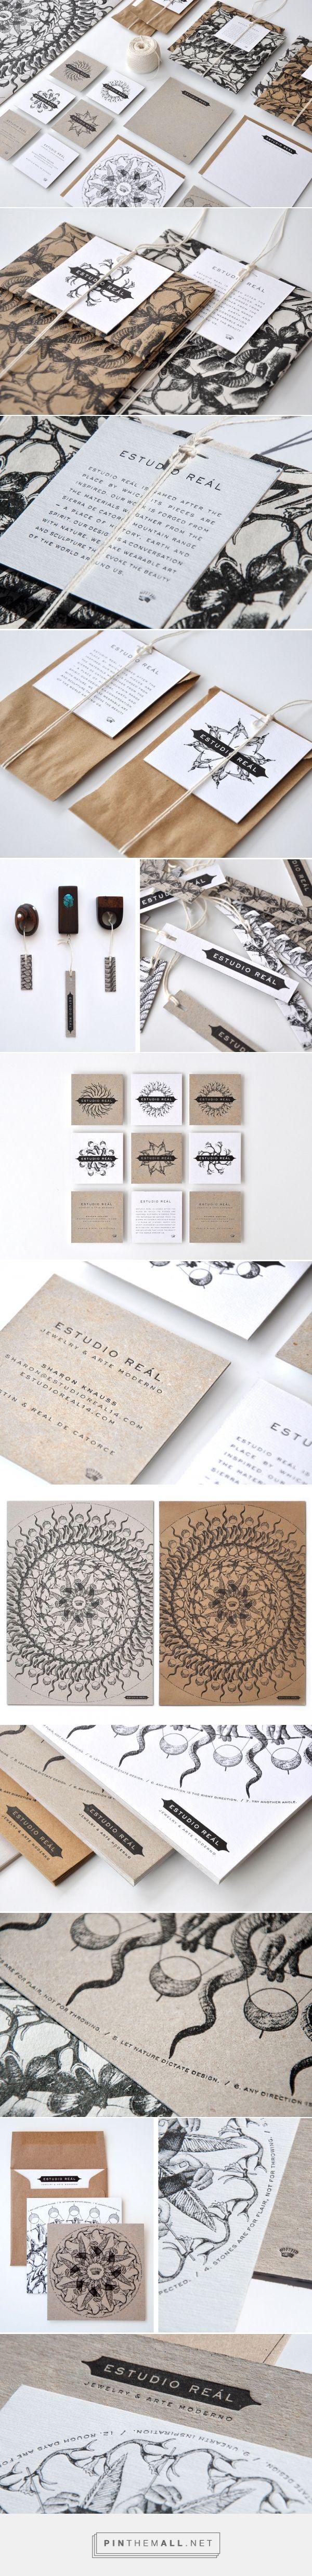 Estudio Real Branding by Design Ranch   Fivestar Branding – Design and Branding Agency & Inspiration Gallery